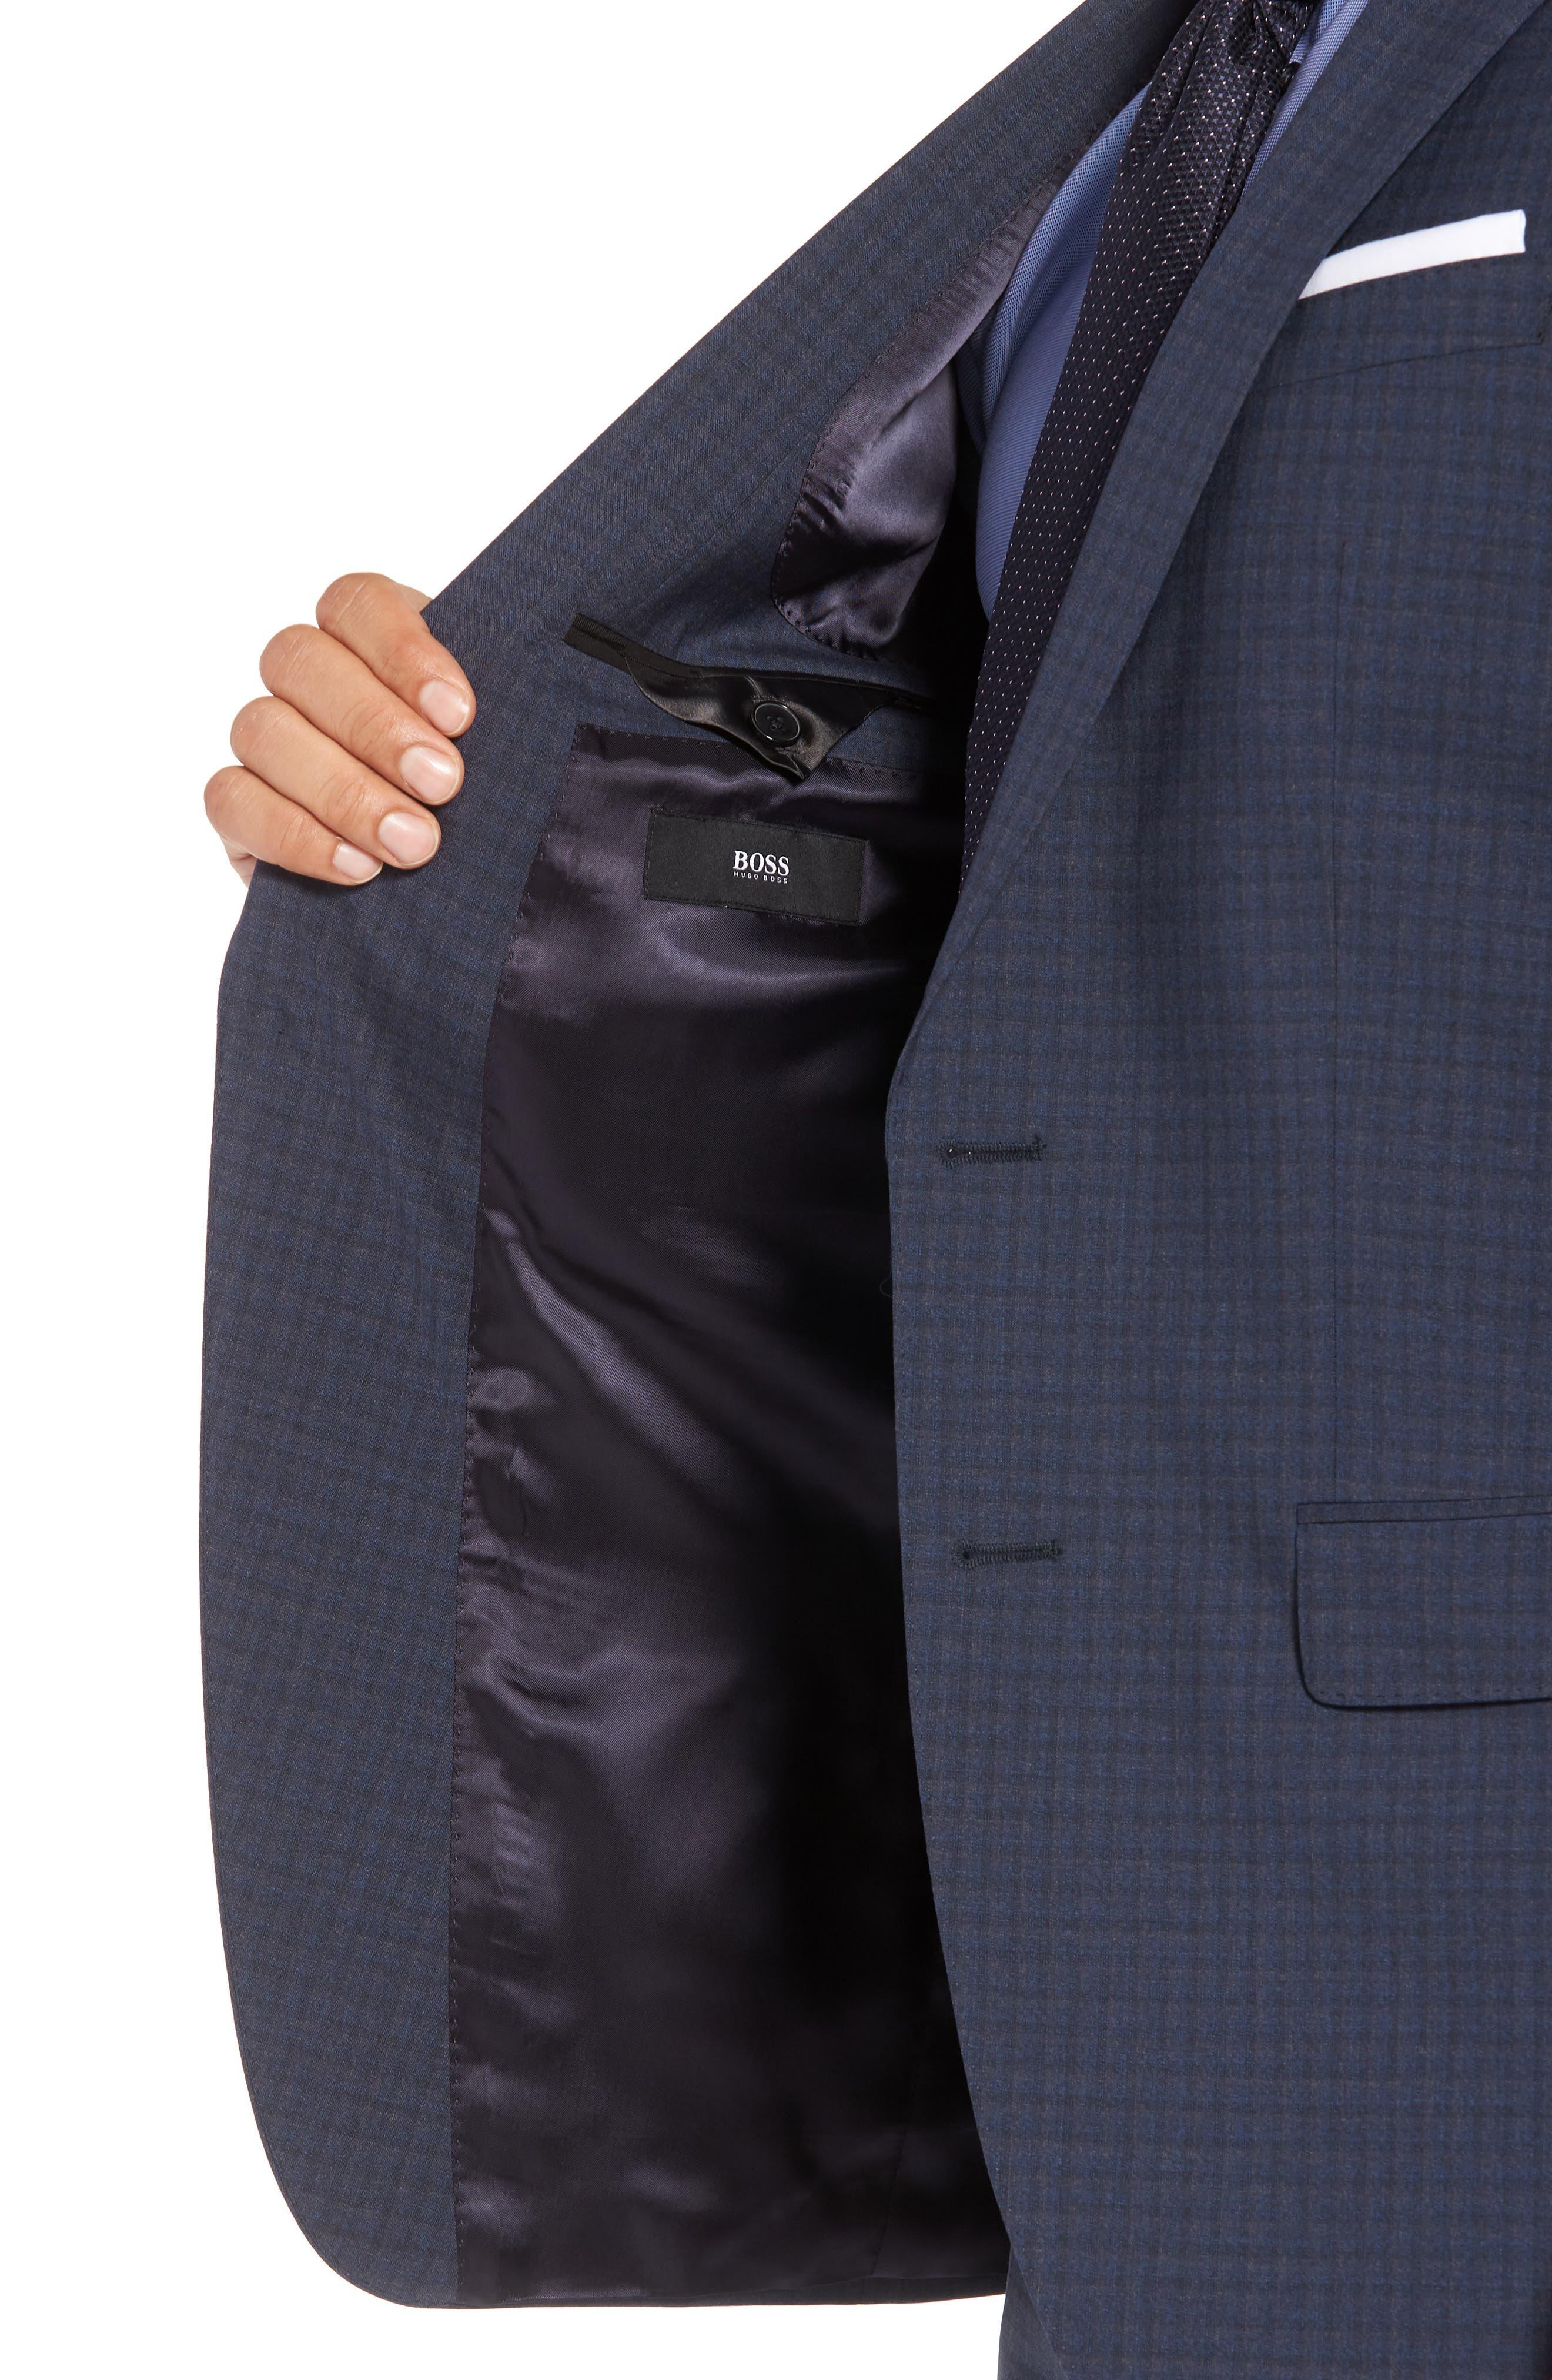 Huge/Genius Trim Fit Check Wool Suit,                             Alternate thumbnail 4, color,                             Blue/ Brown/ Charcoal